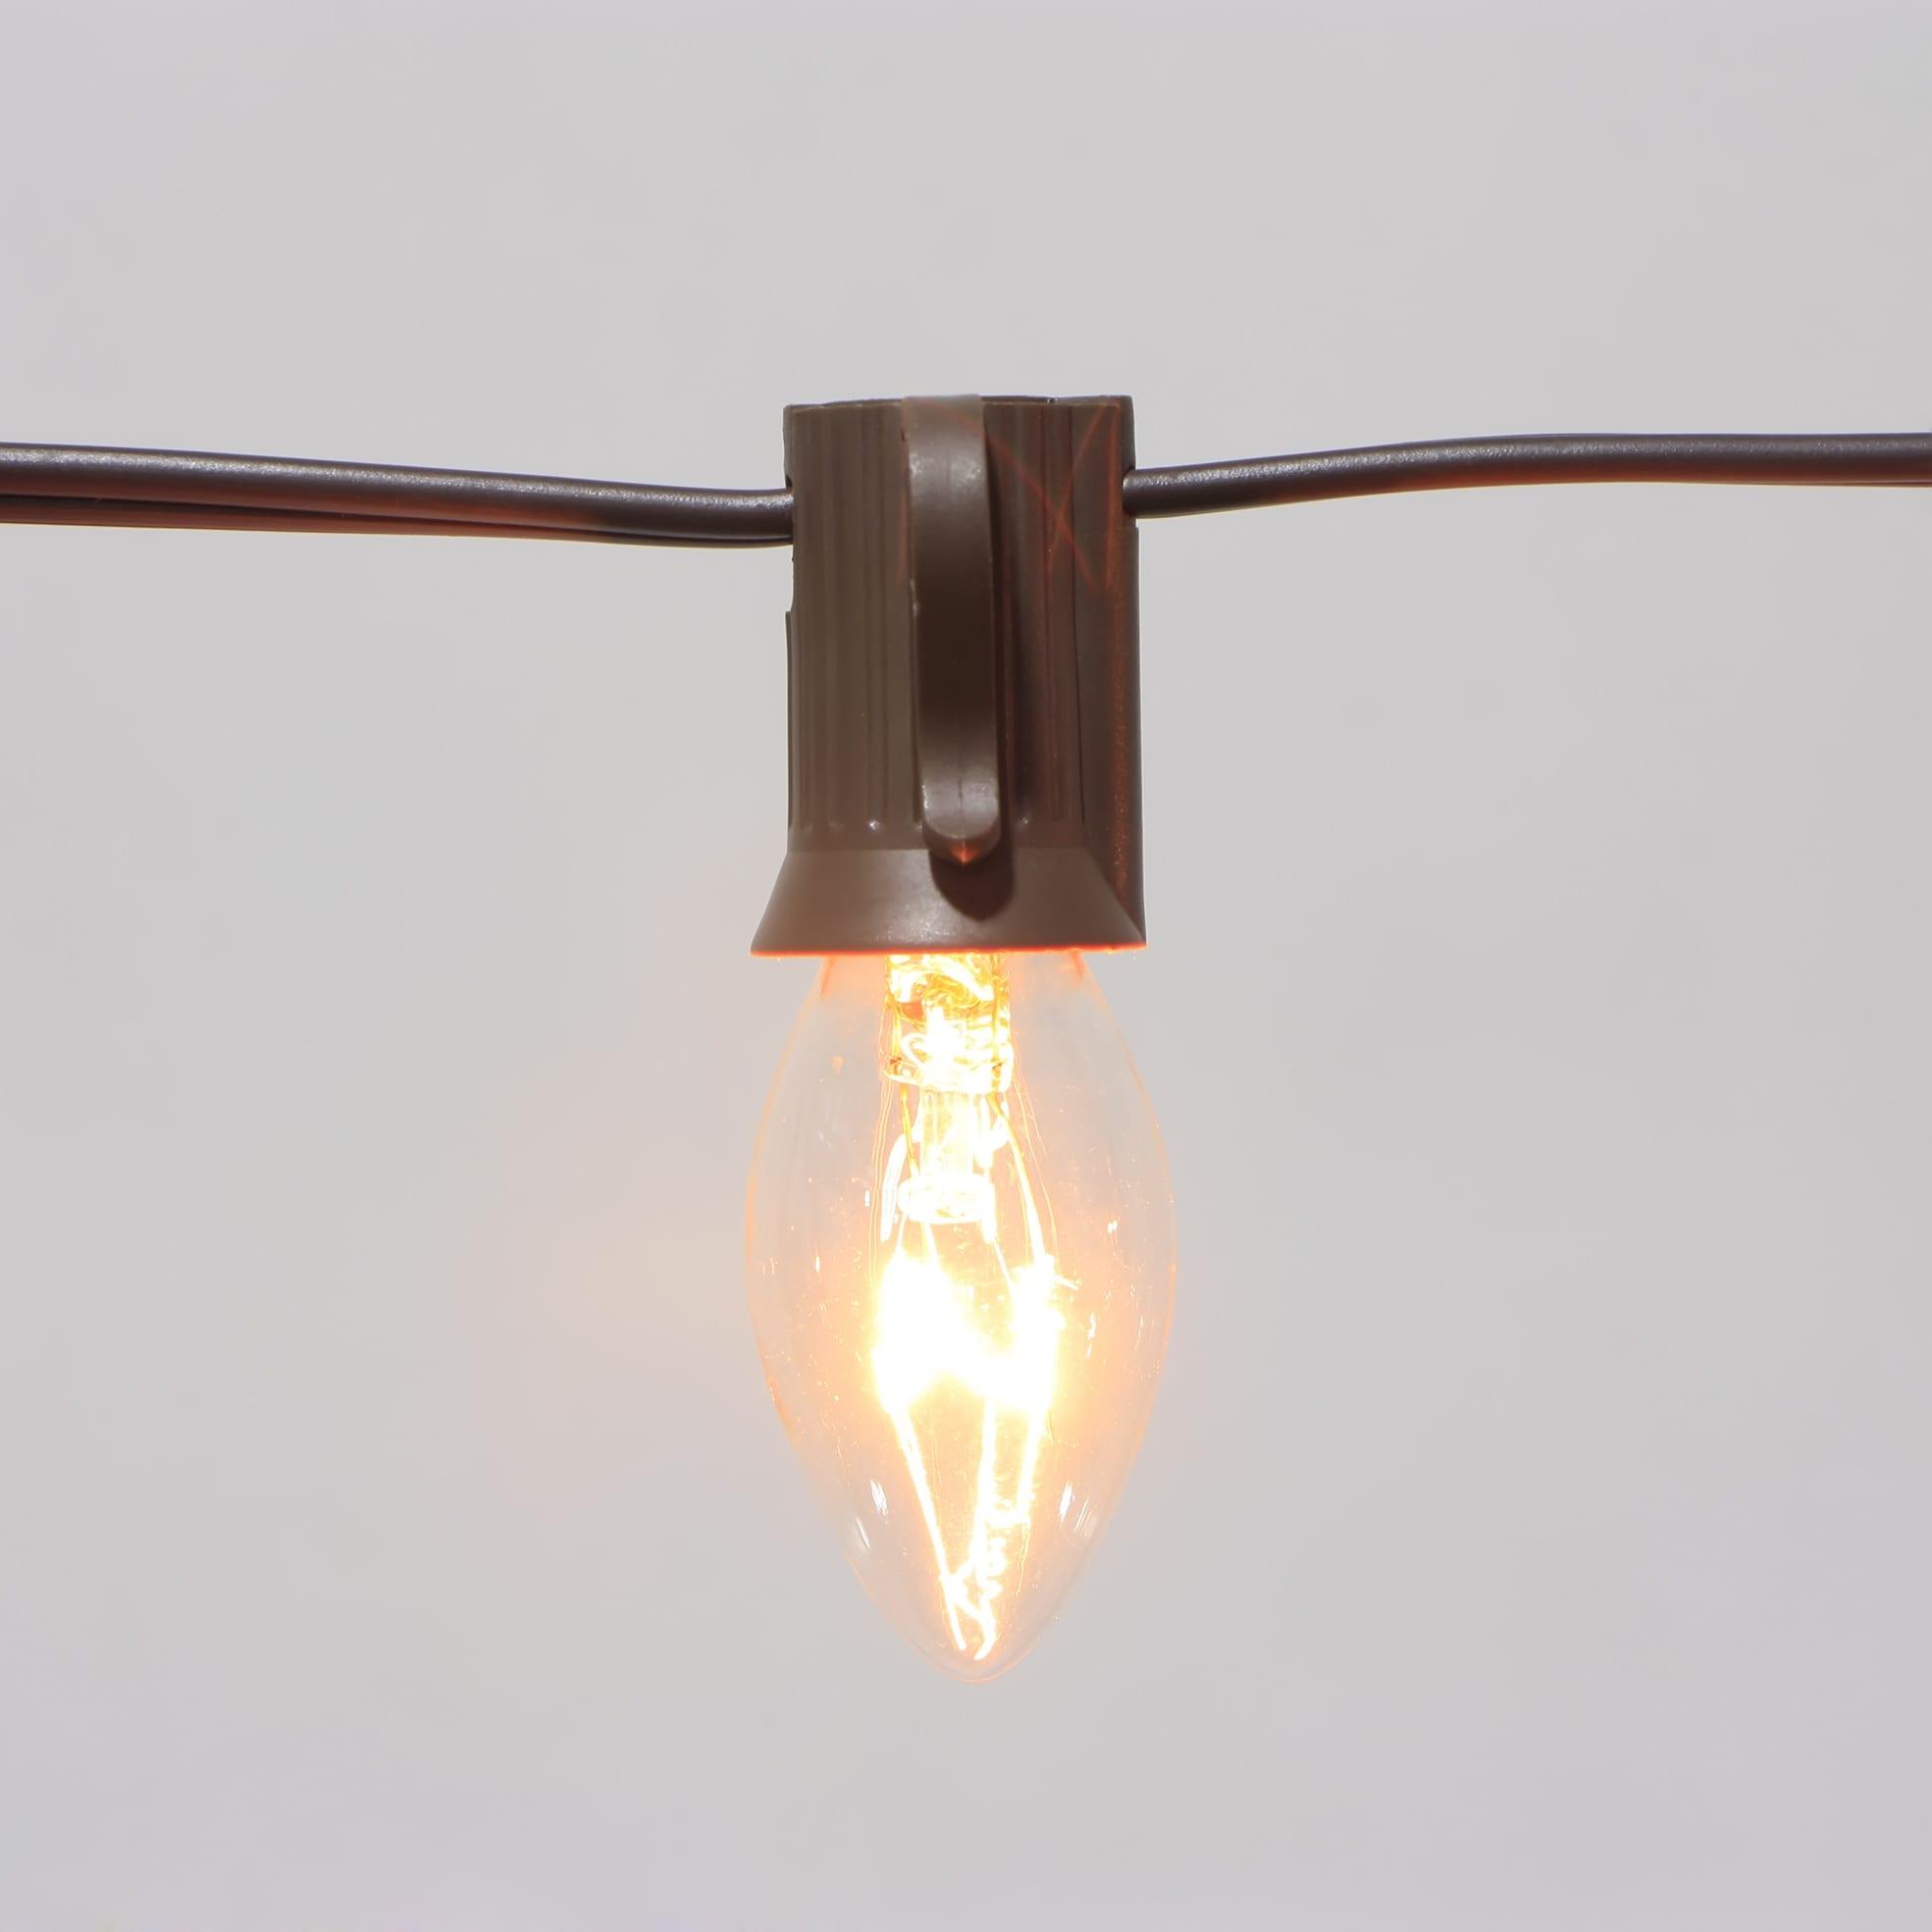 Incandescent Lighting & Led Edison Light Bulbs KF41059C9 Featured Image